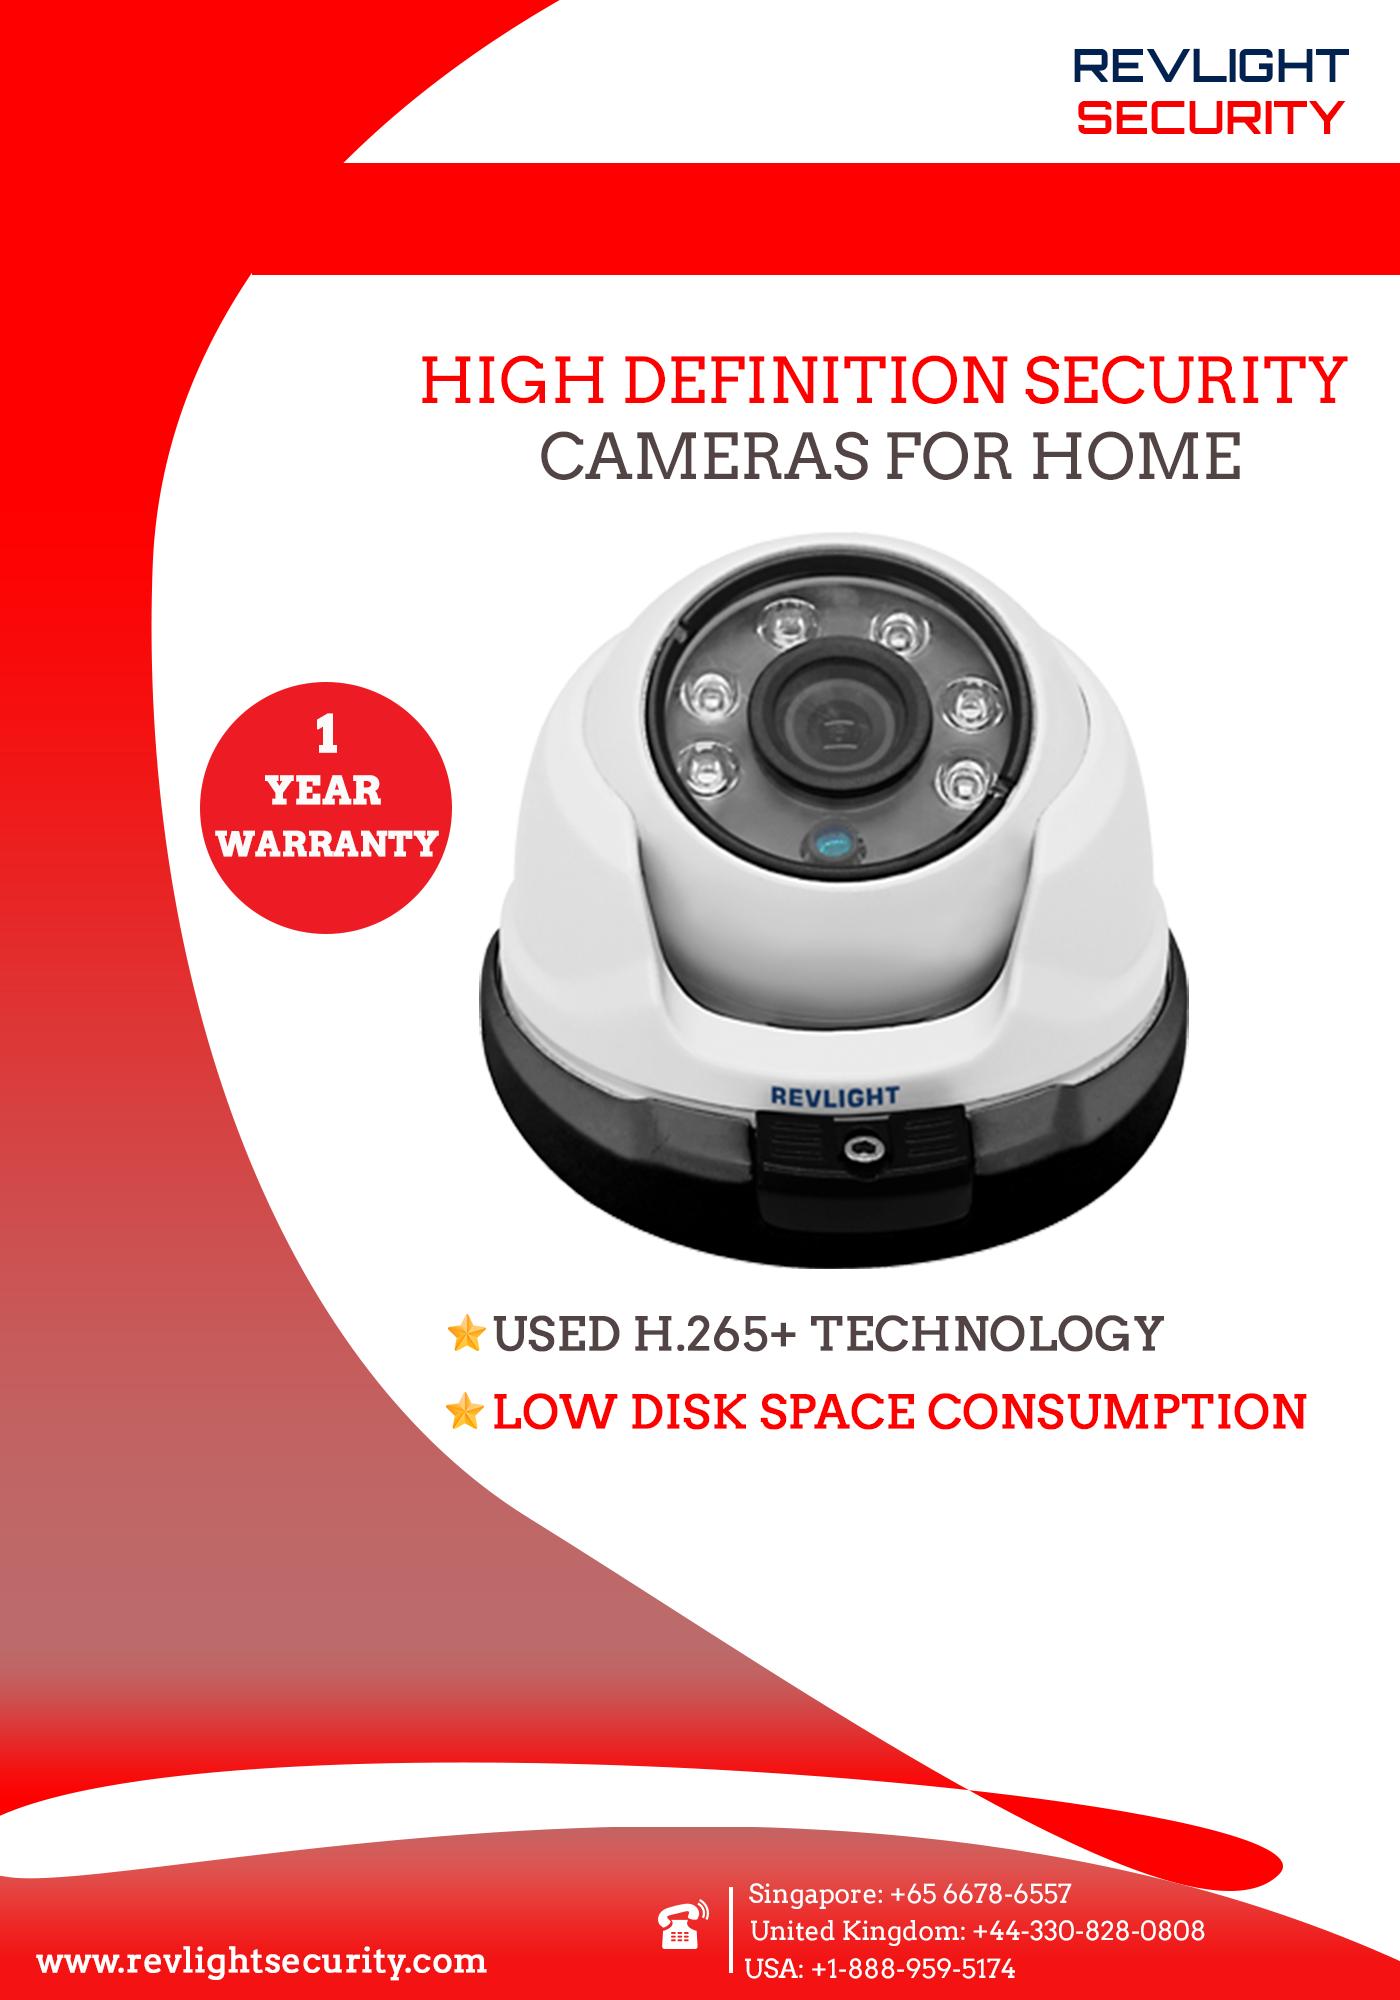 16 Camera Ip Security Cctv System Revlight Security Security Cameras For Home Wireless Security System Best Home Security System